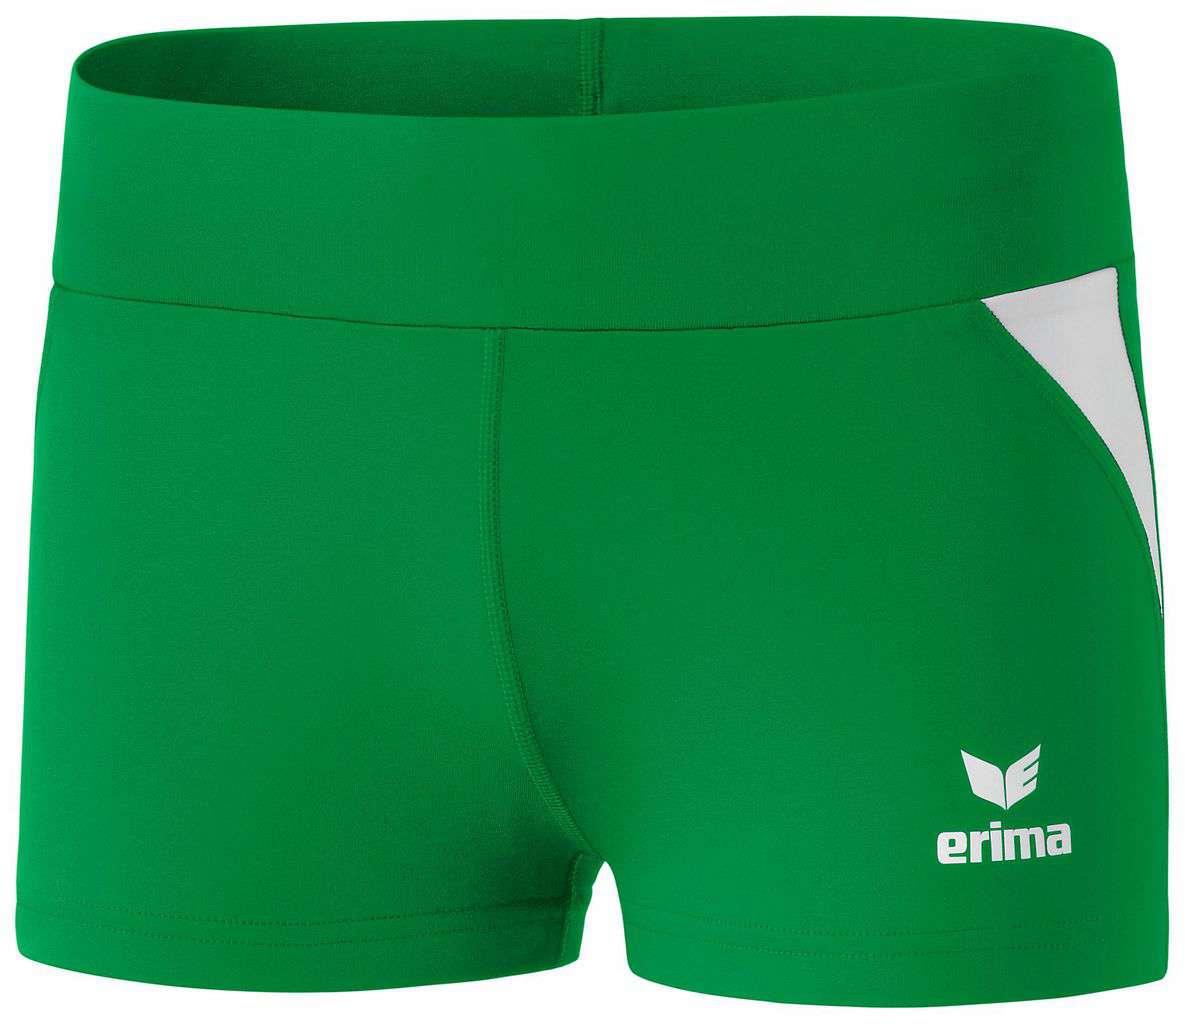 Erima-Hotpants-829510_JPG